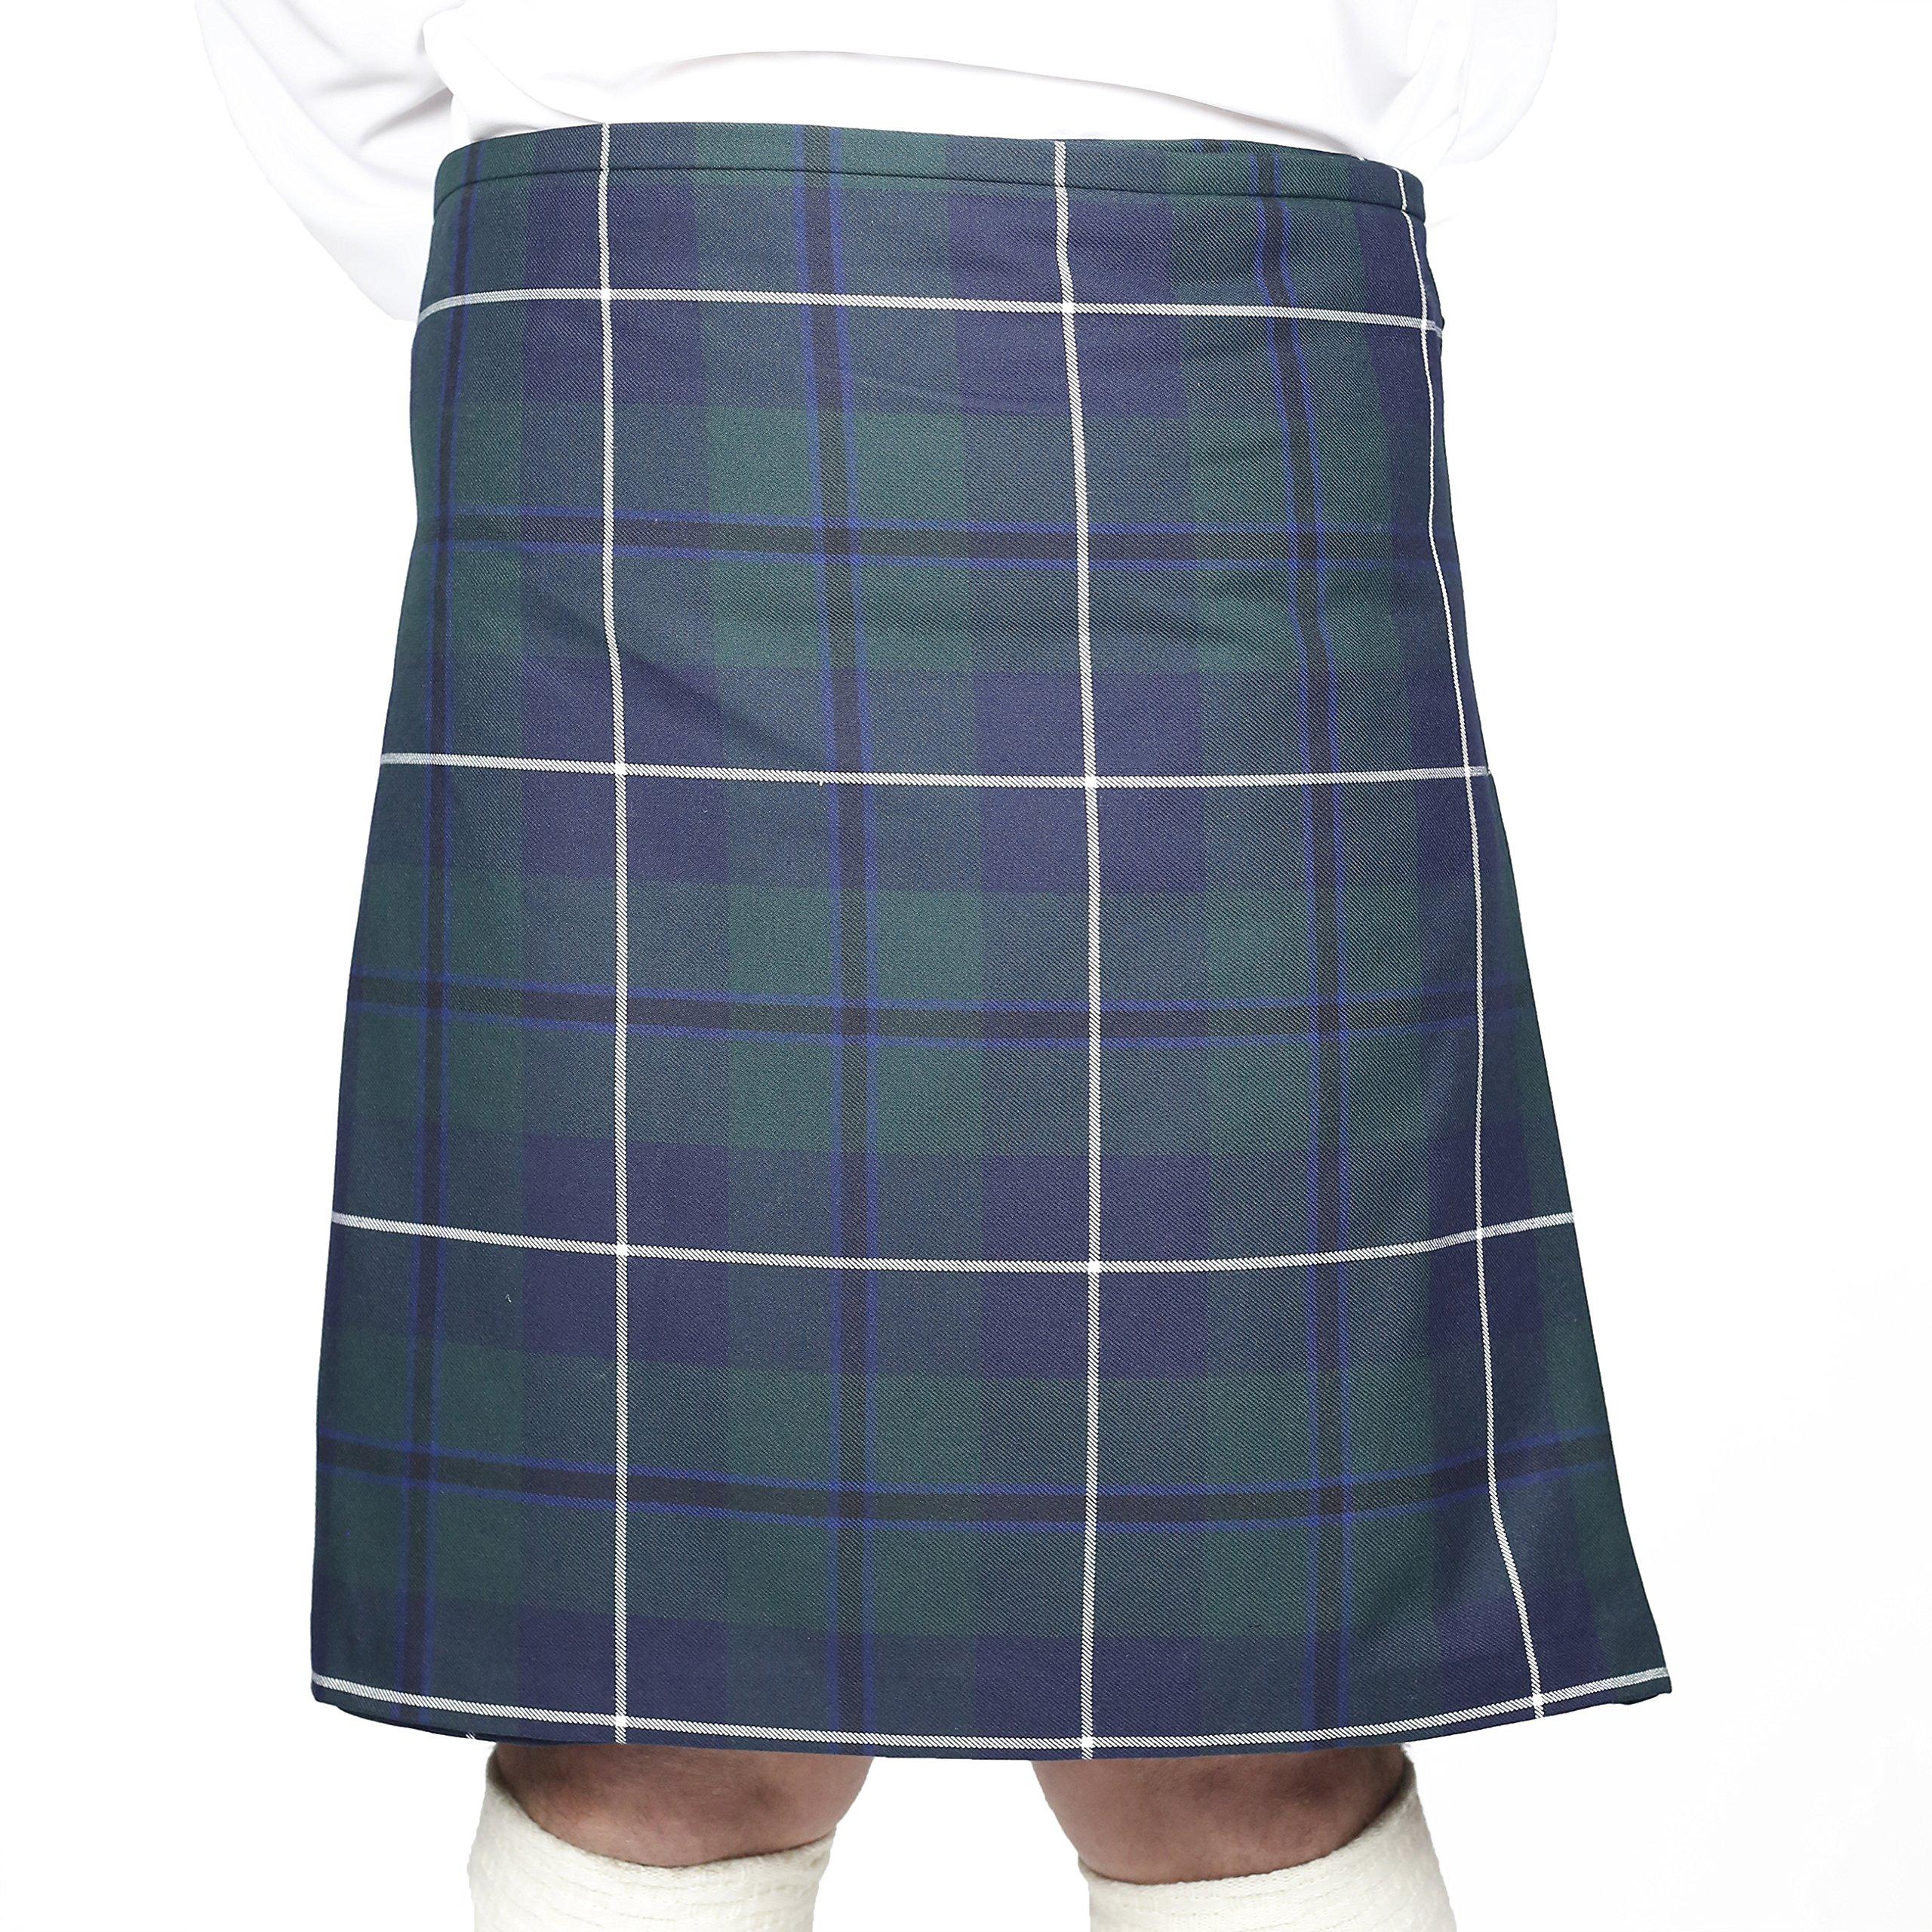 Kilt Society Mens 8 Yard Scottish Kilt Douglas Tartan 42'' to 46''